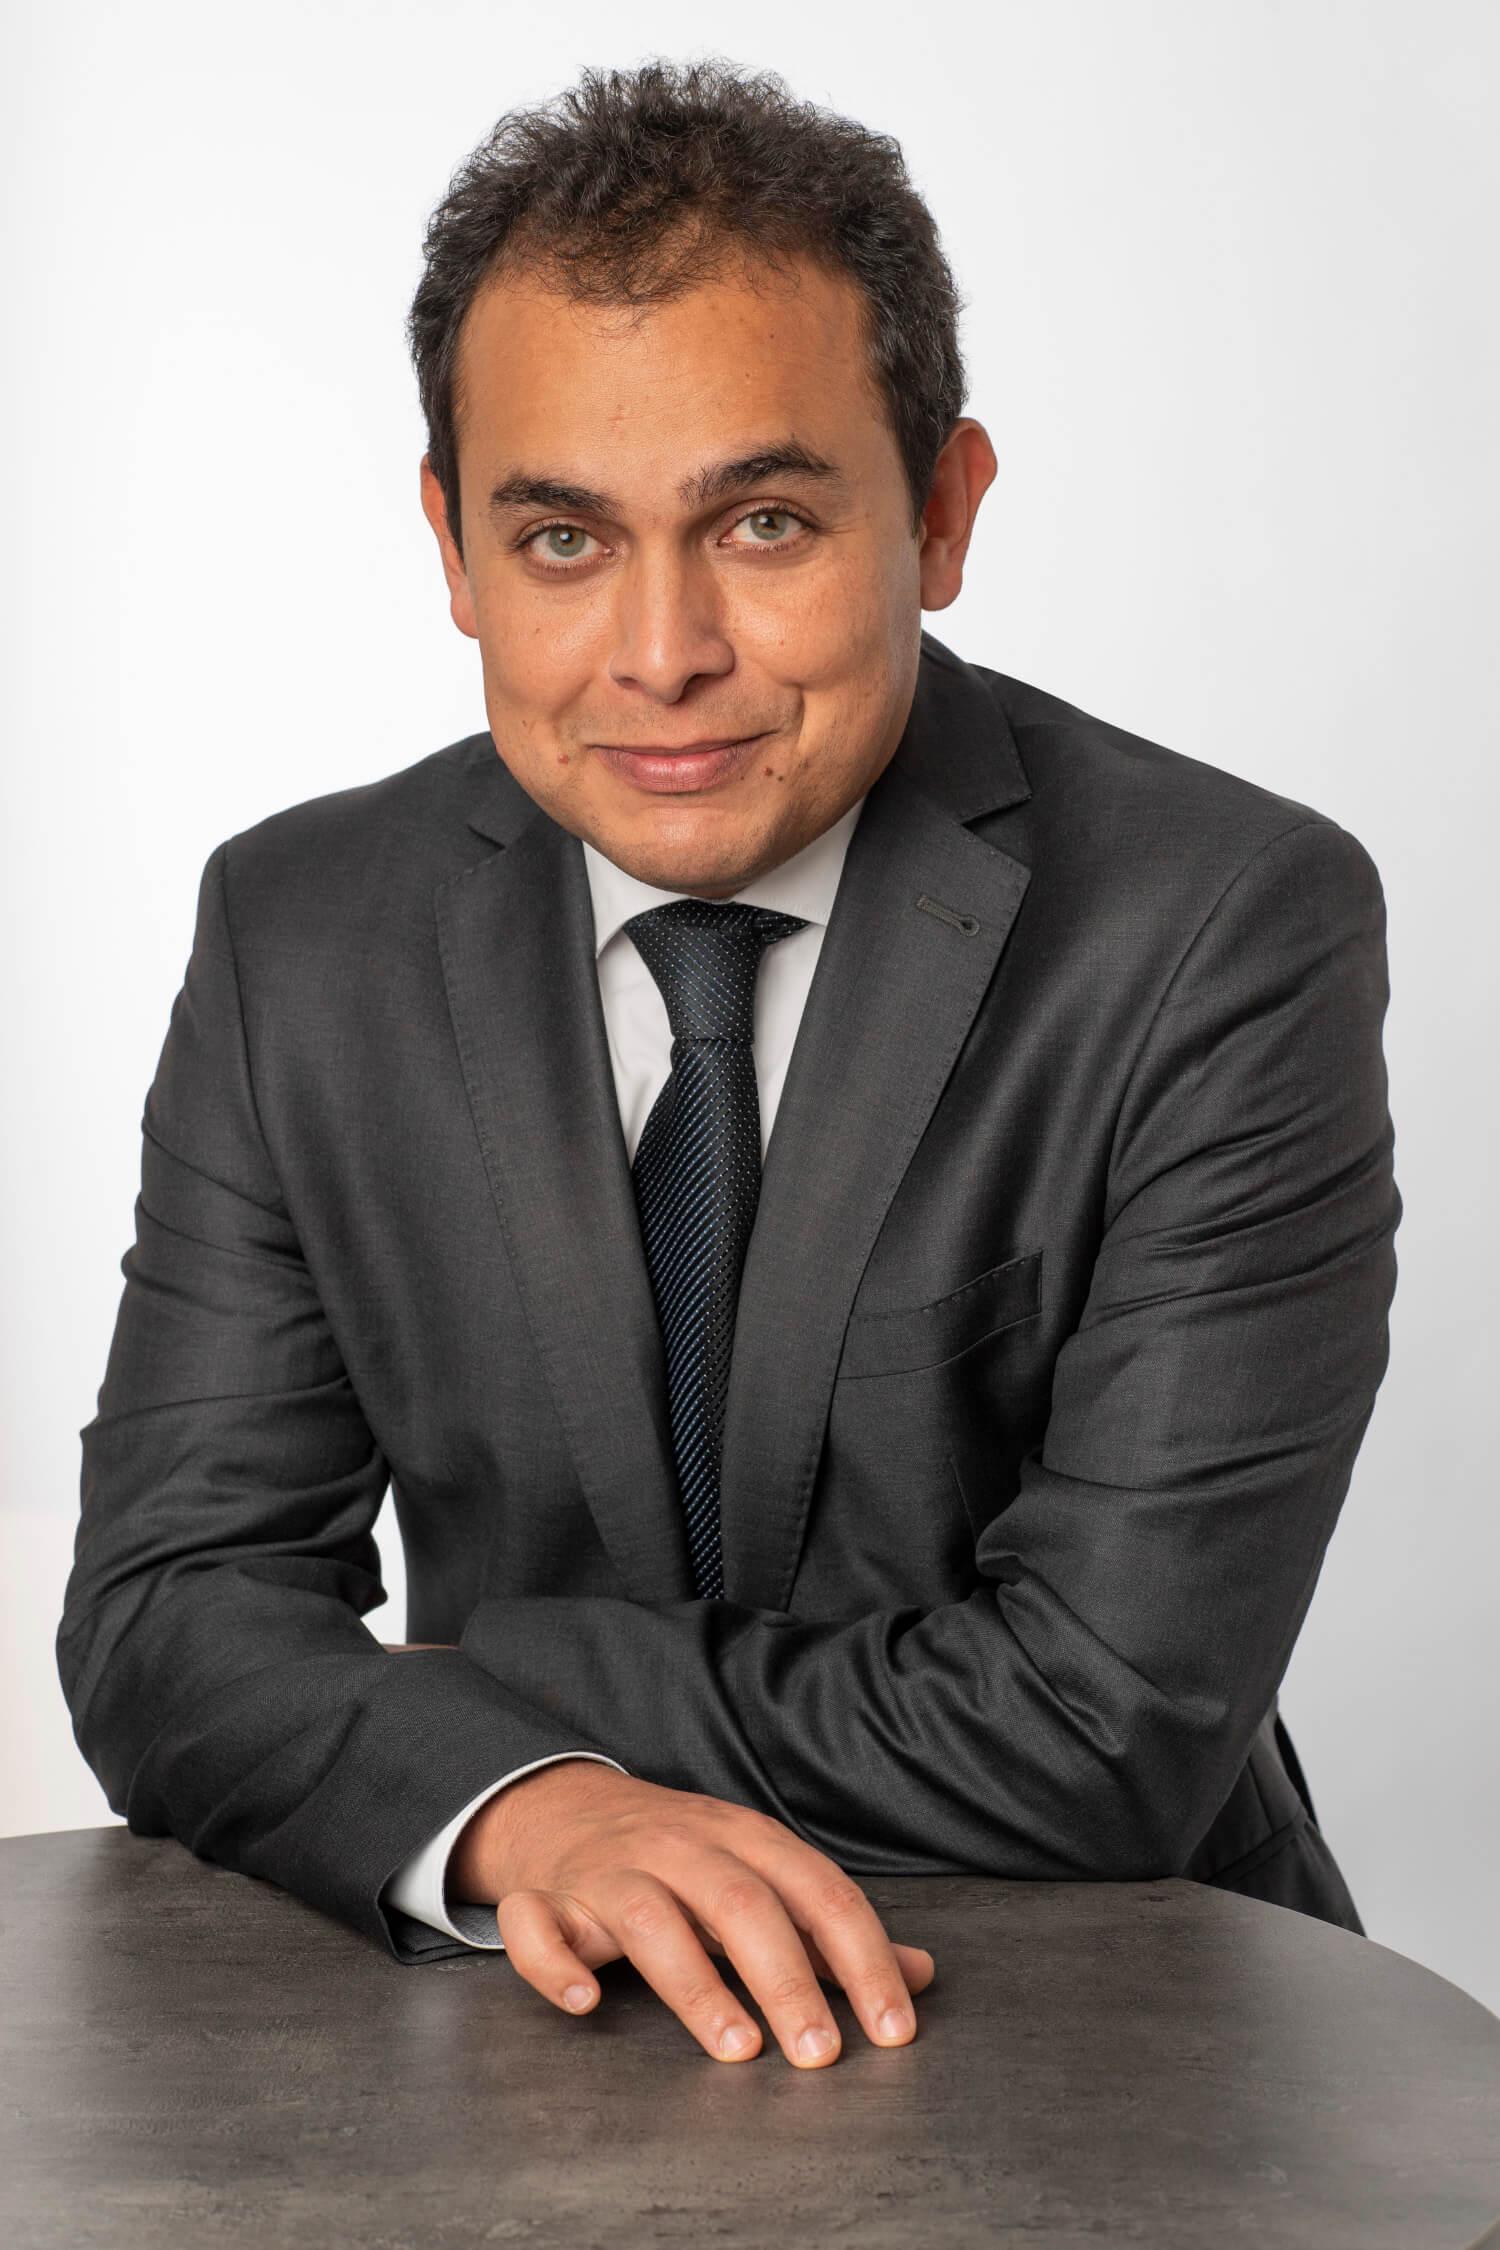 Abdelaziz Amraoui